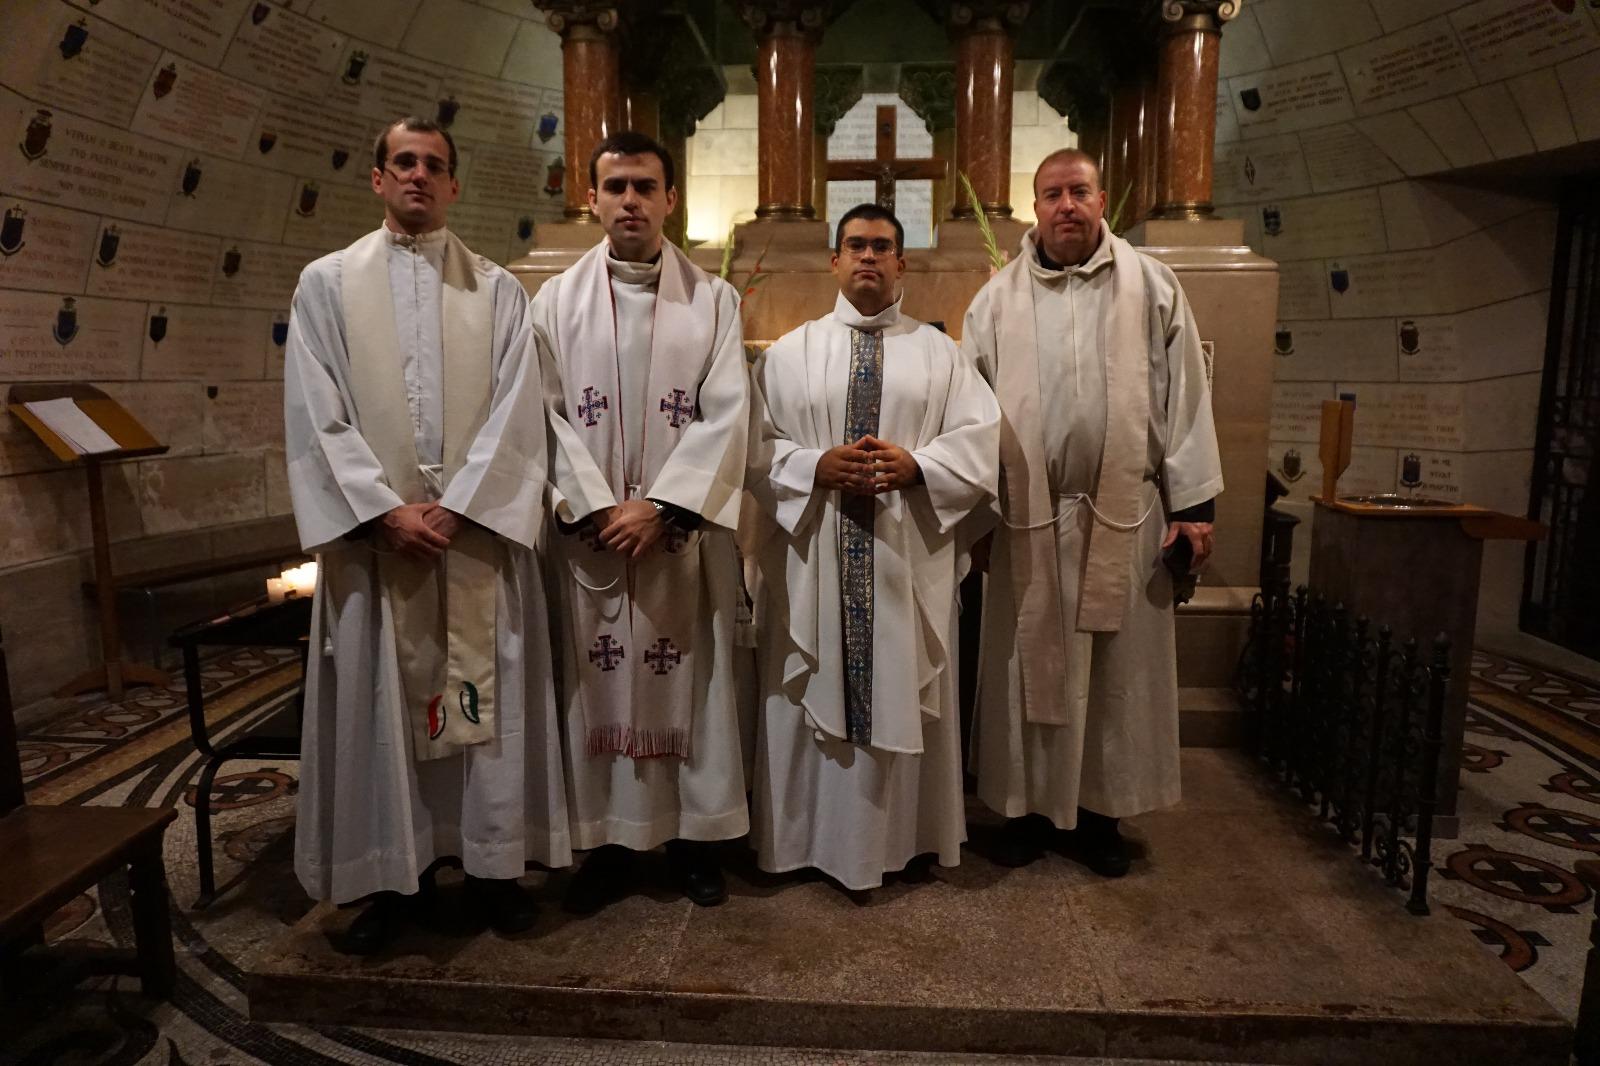 Luego de la Misa en la tumba de San Martín